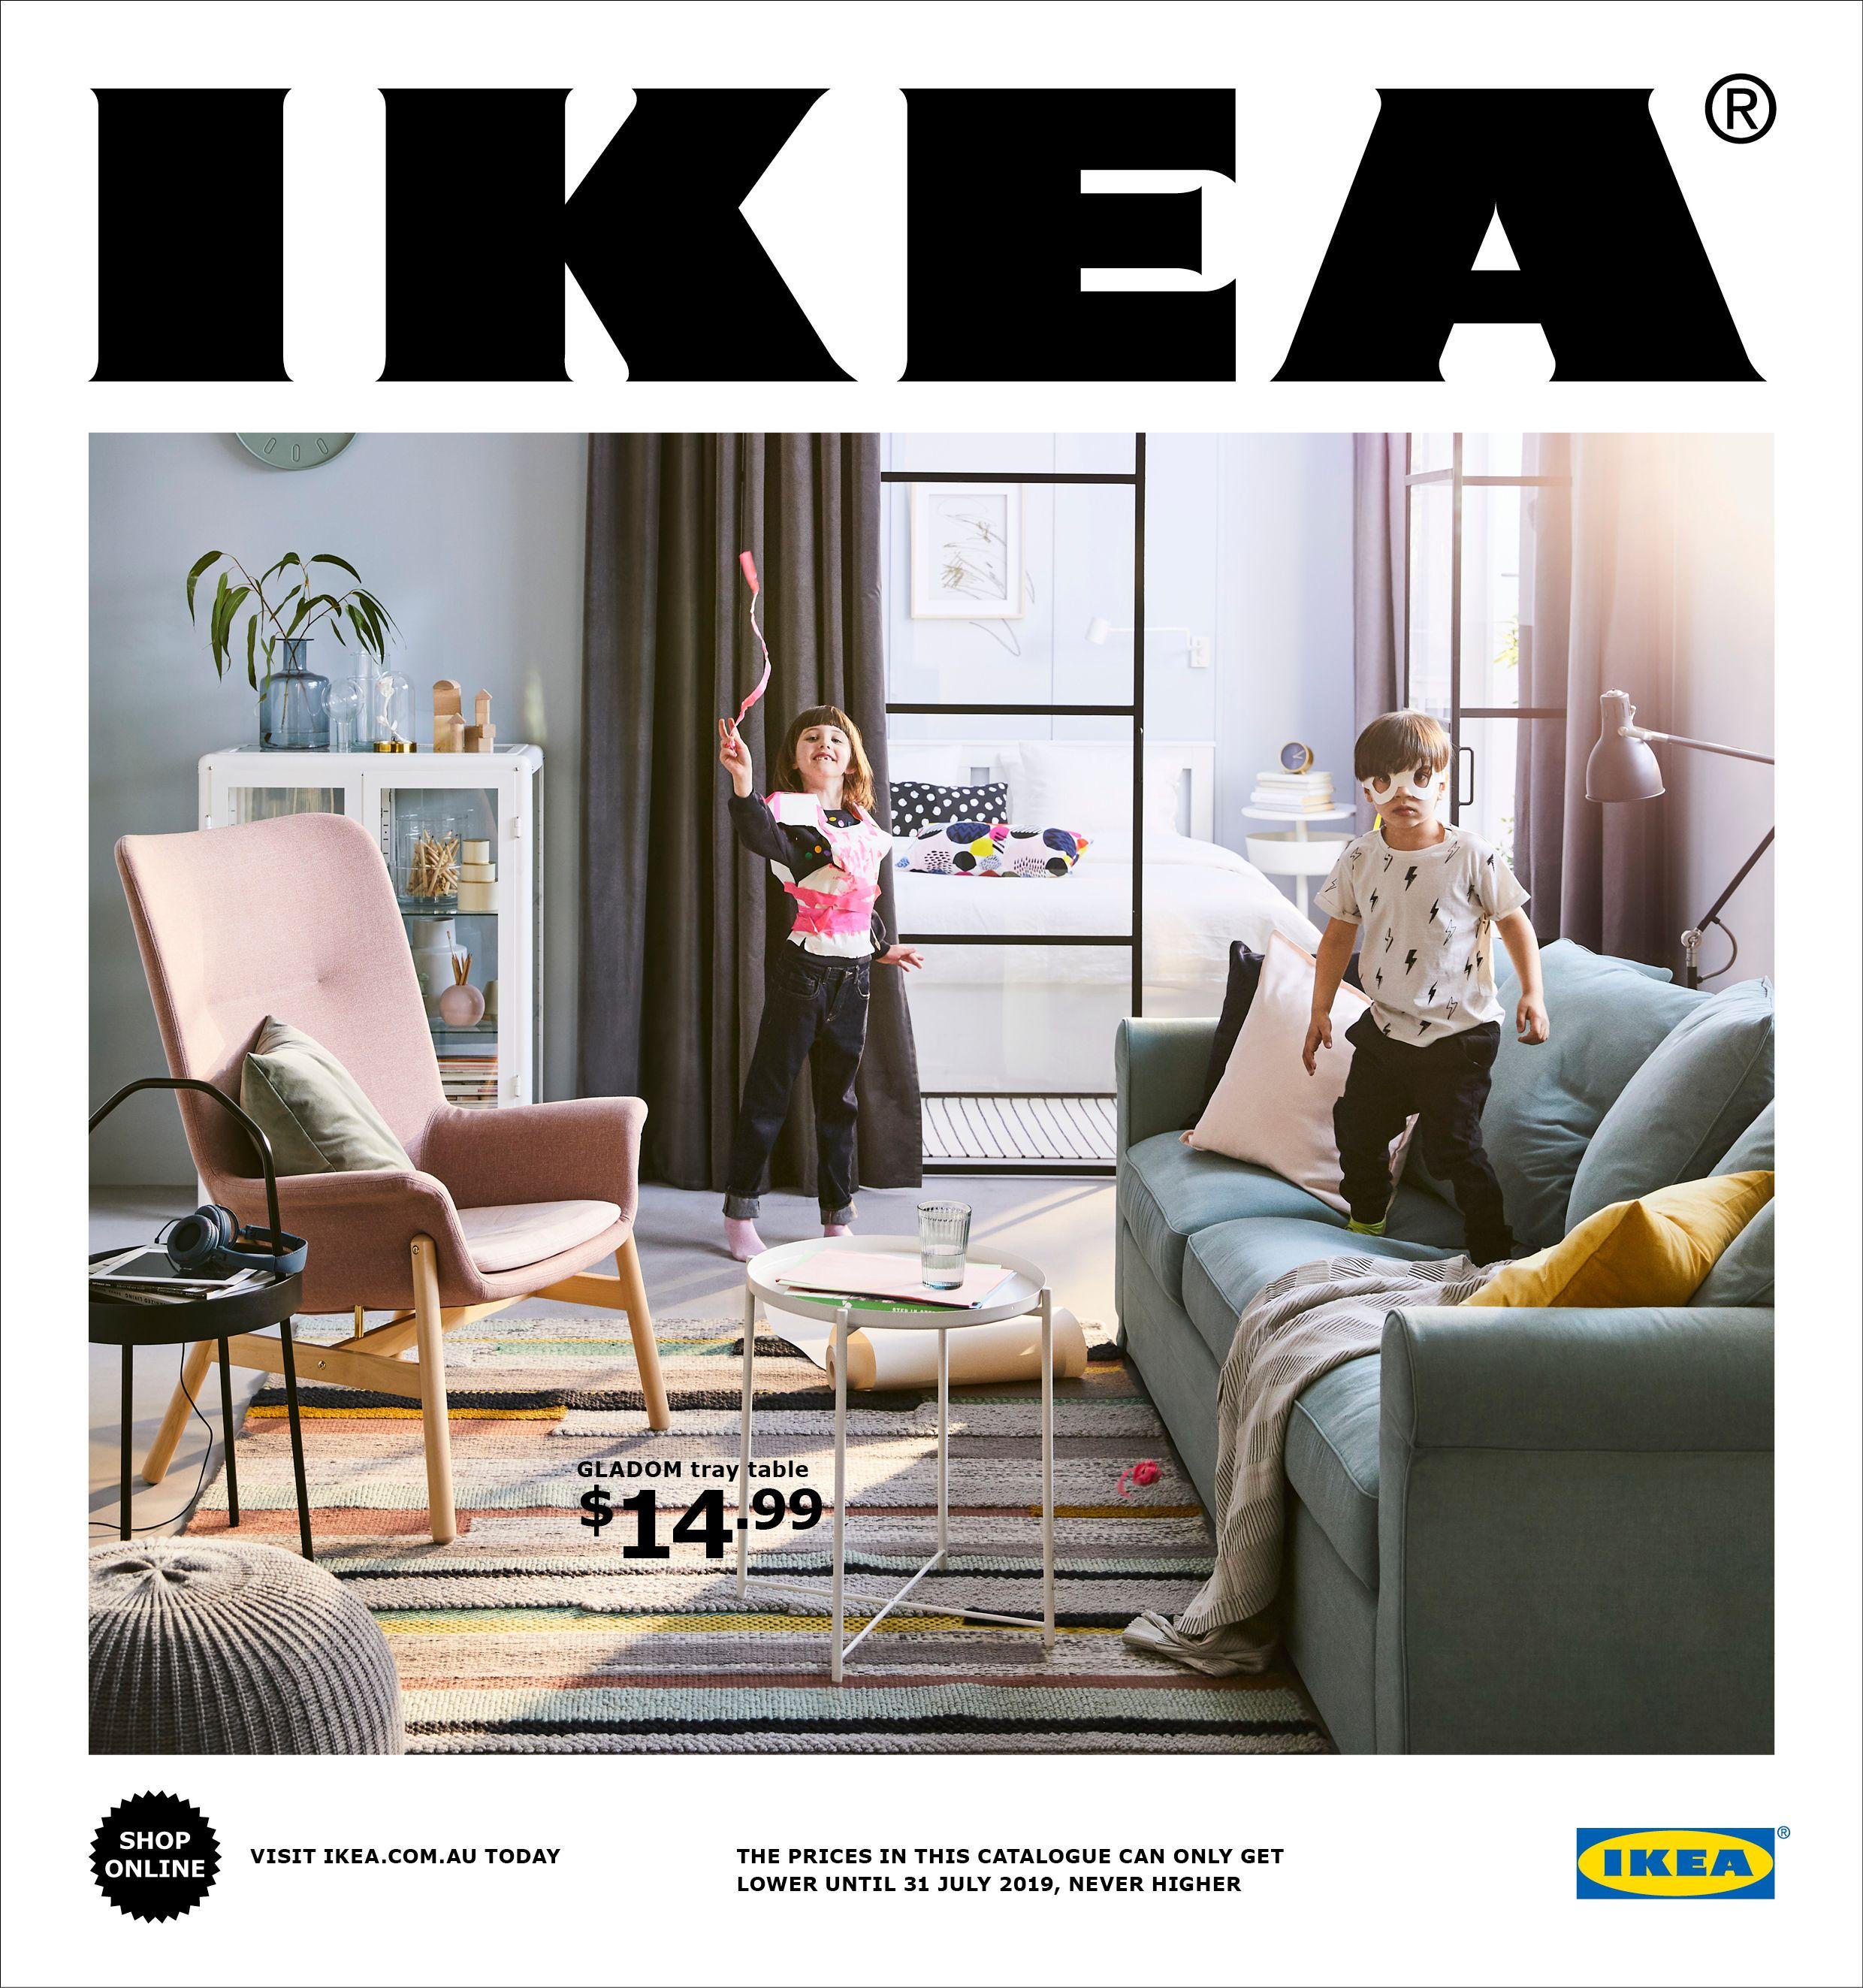 2019 IKEA Catalogue IKEA Australia Ikea kitchen